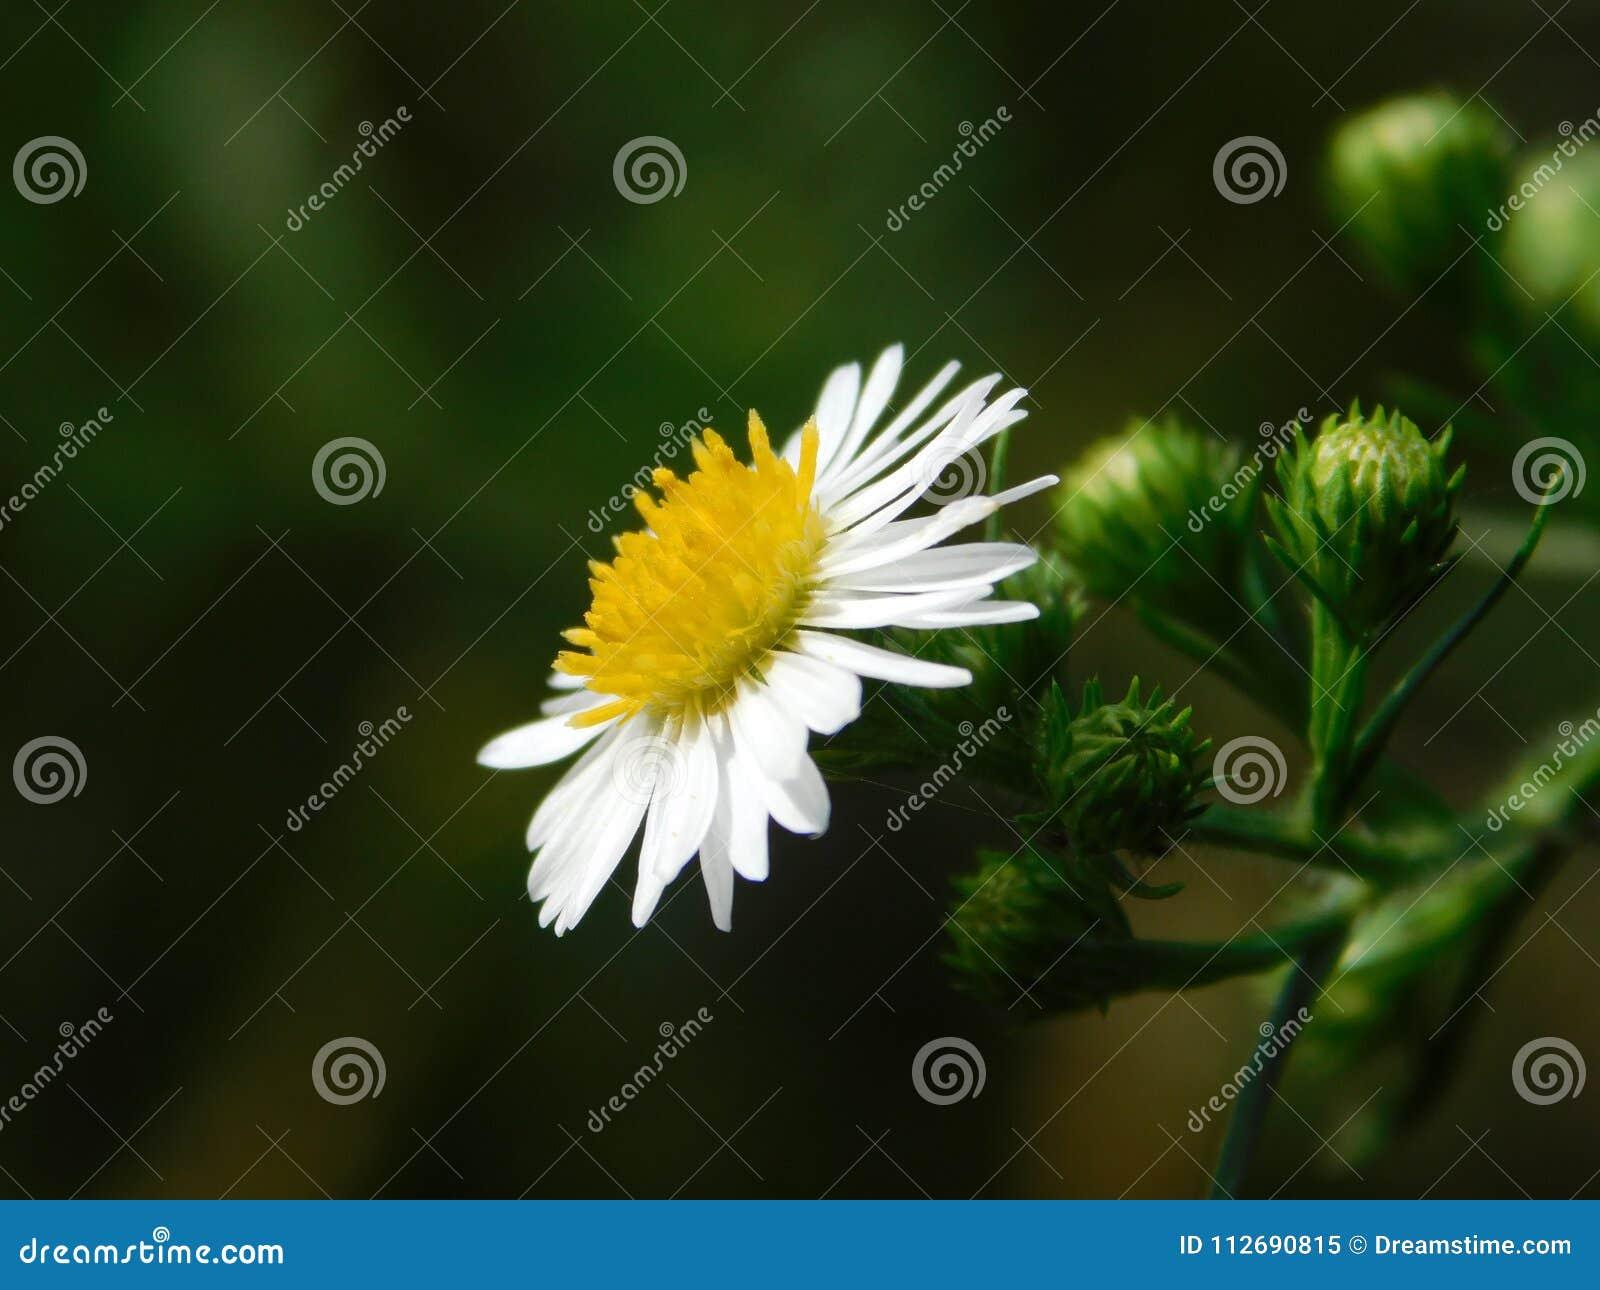 Wild flower on a plant